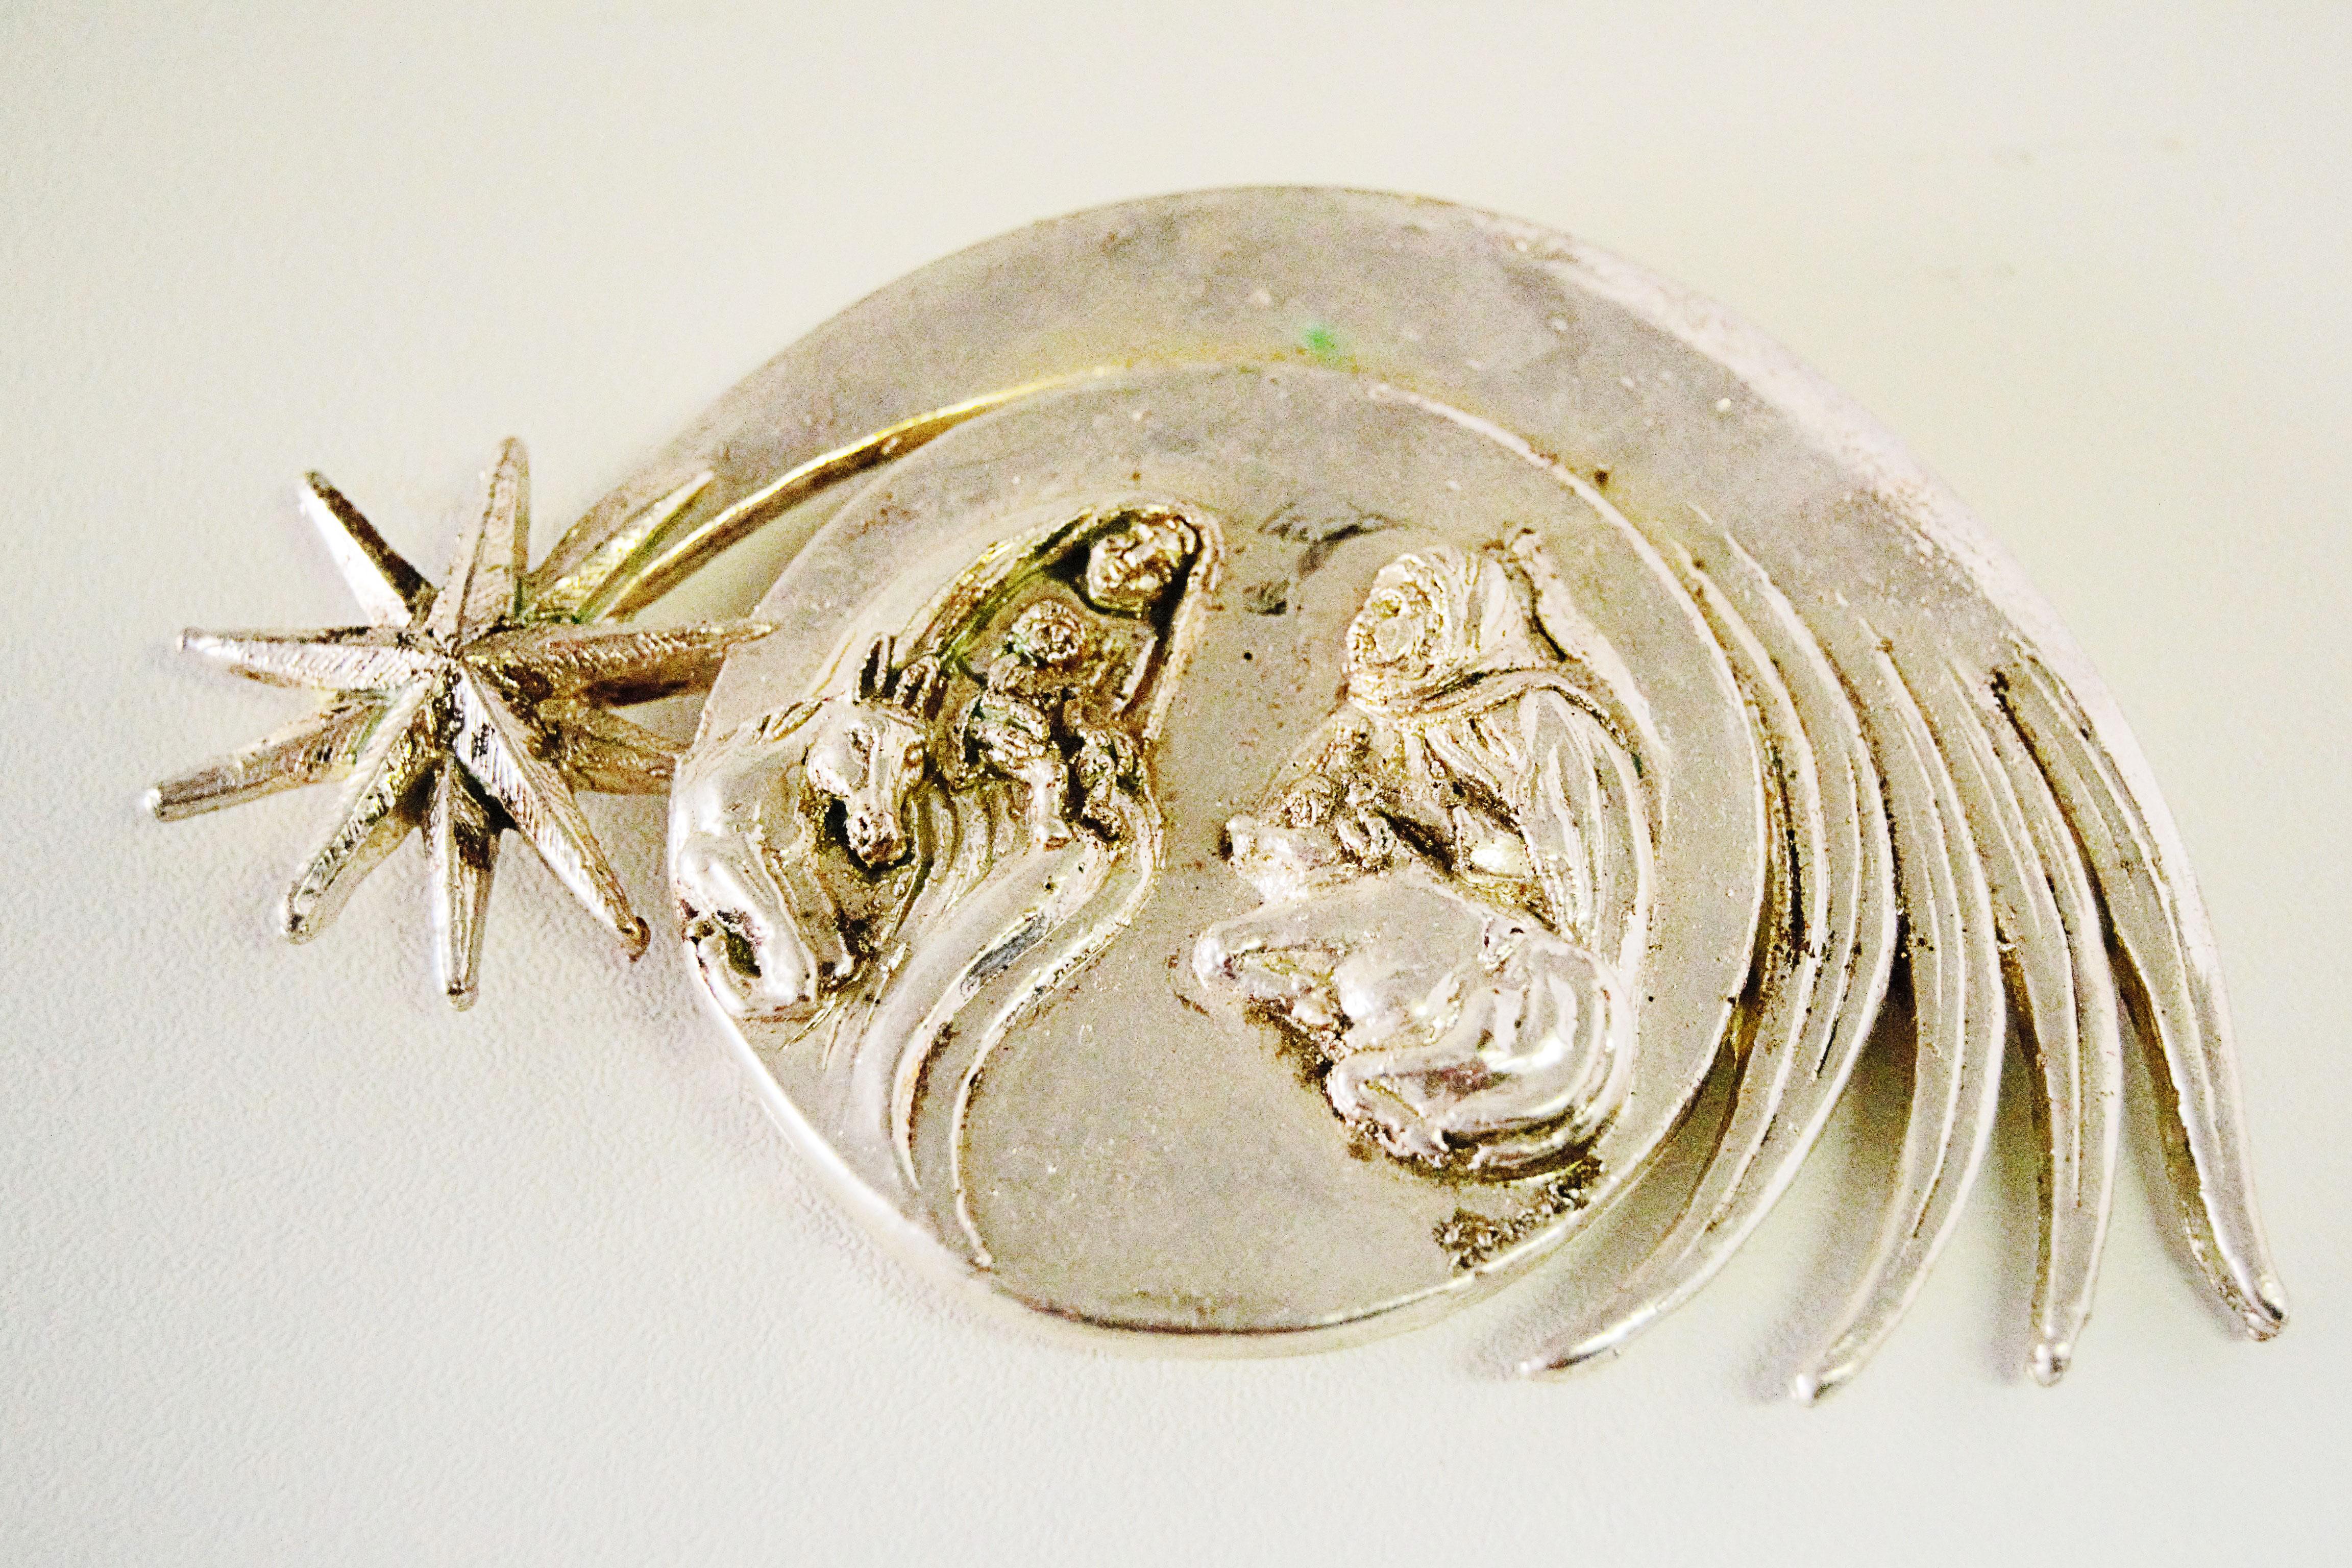 arte sacra, sculture in bronzo, fusioni a cera persa